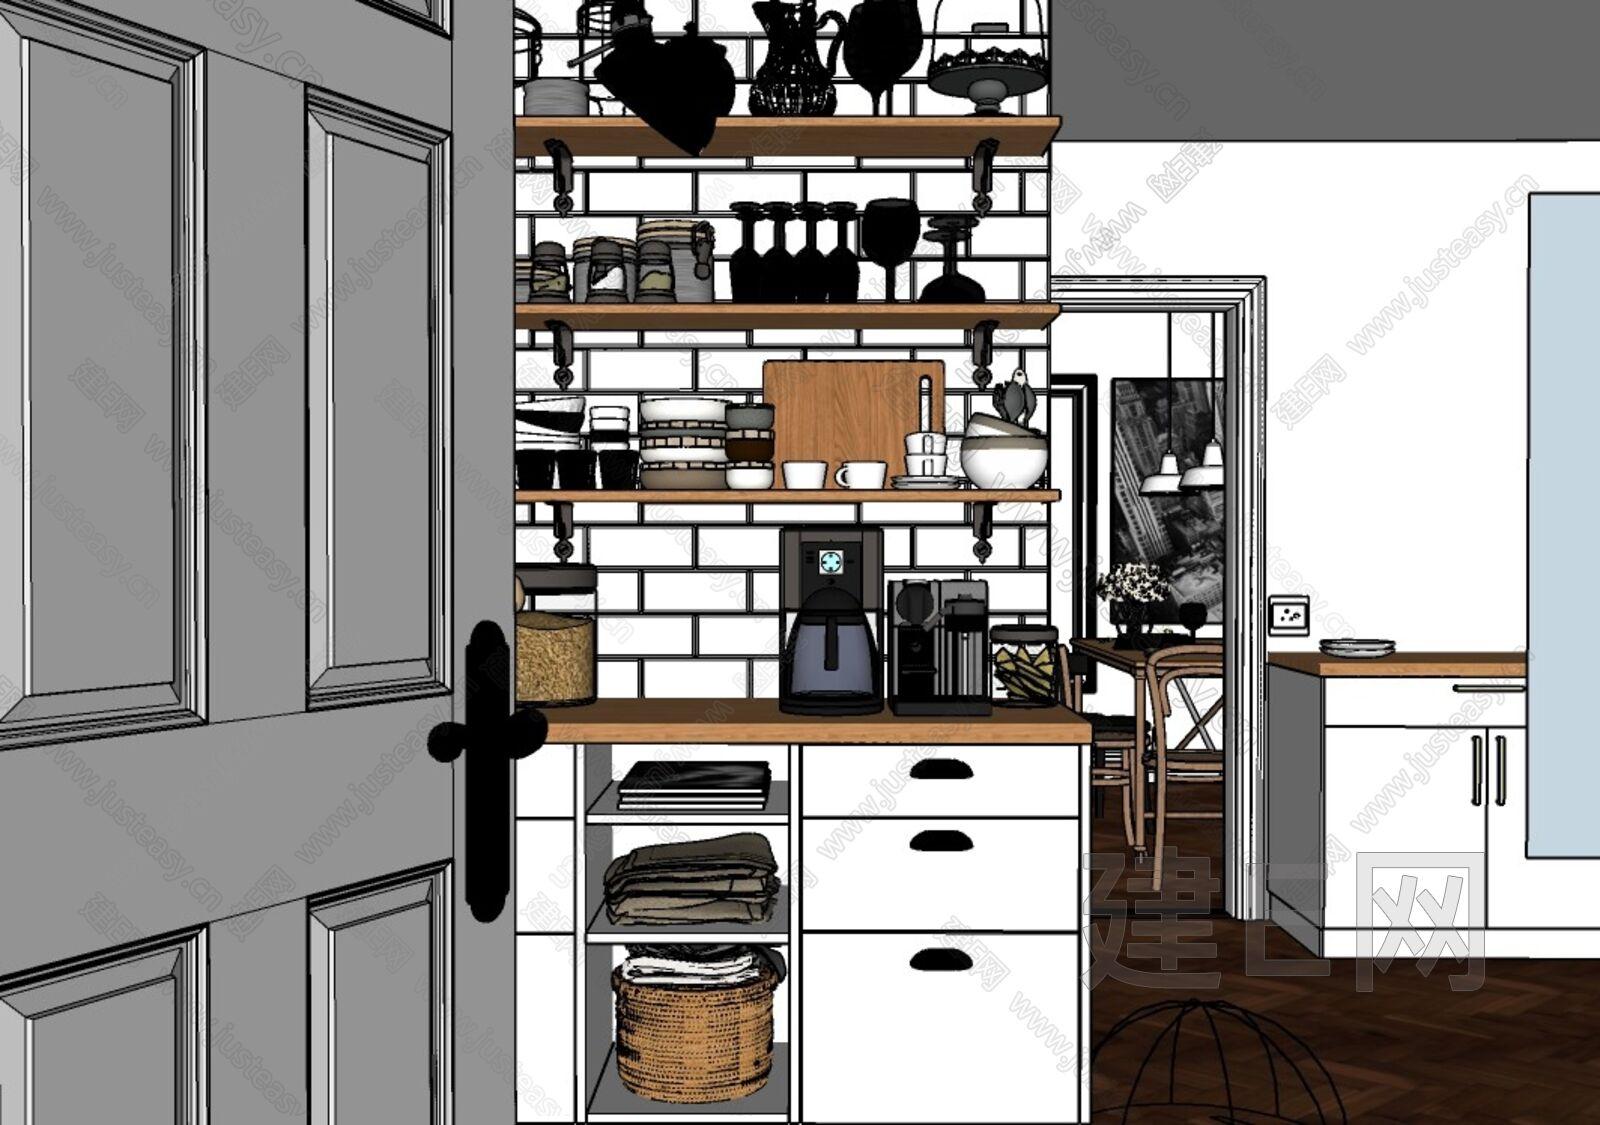 厨房sketchup模型